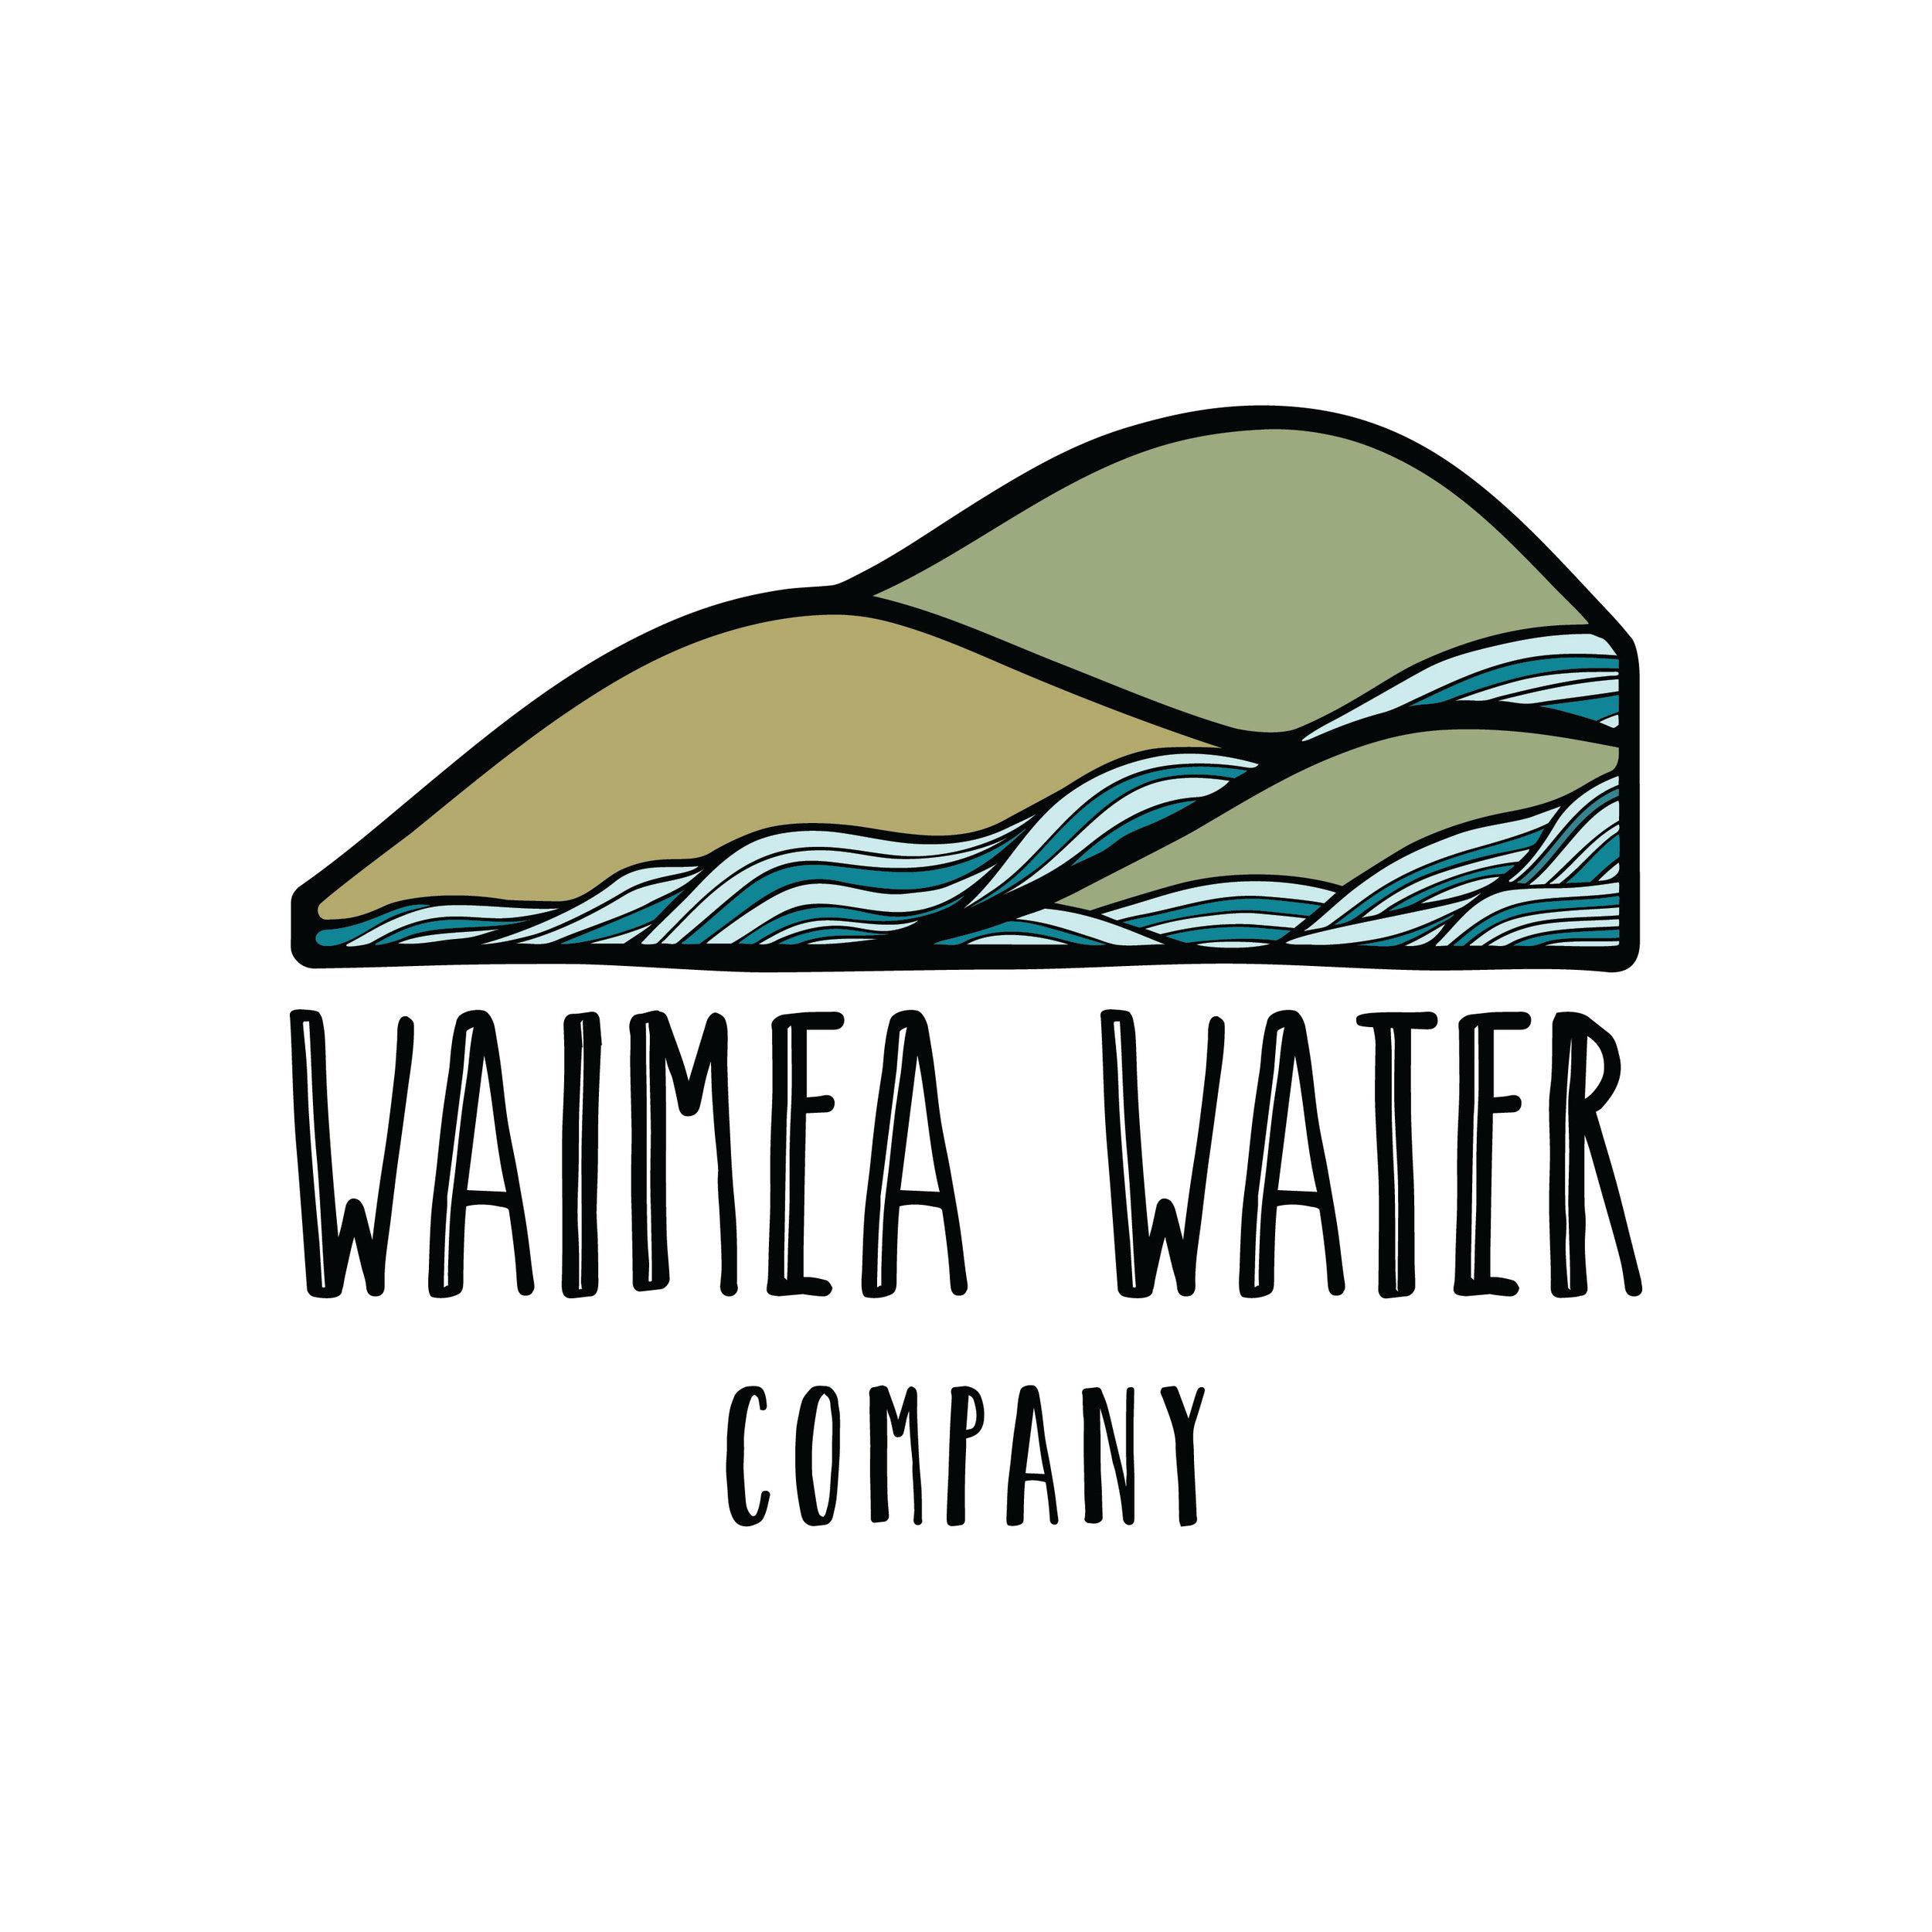 WaimeaWaterCompany_Logo_Colored.jpg